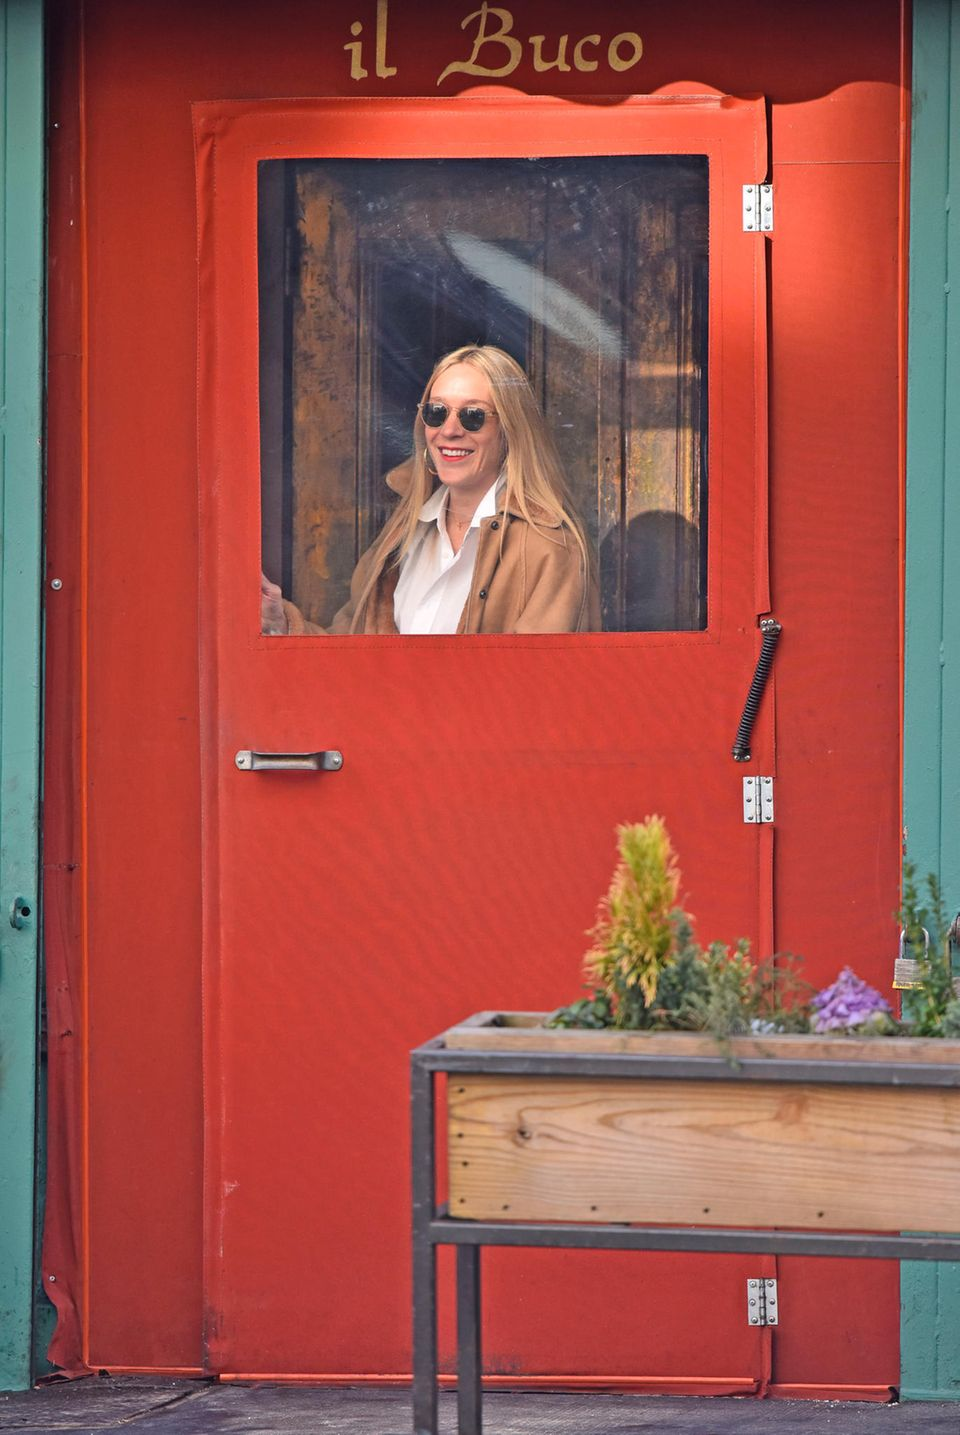 "10. Januar 2018  SchauspielerinChloë Sevigny kommt gerade aus dem Restaurant ""Il Buco"" in New York."